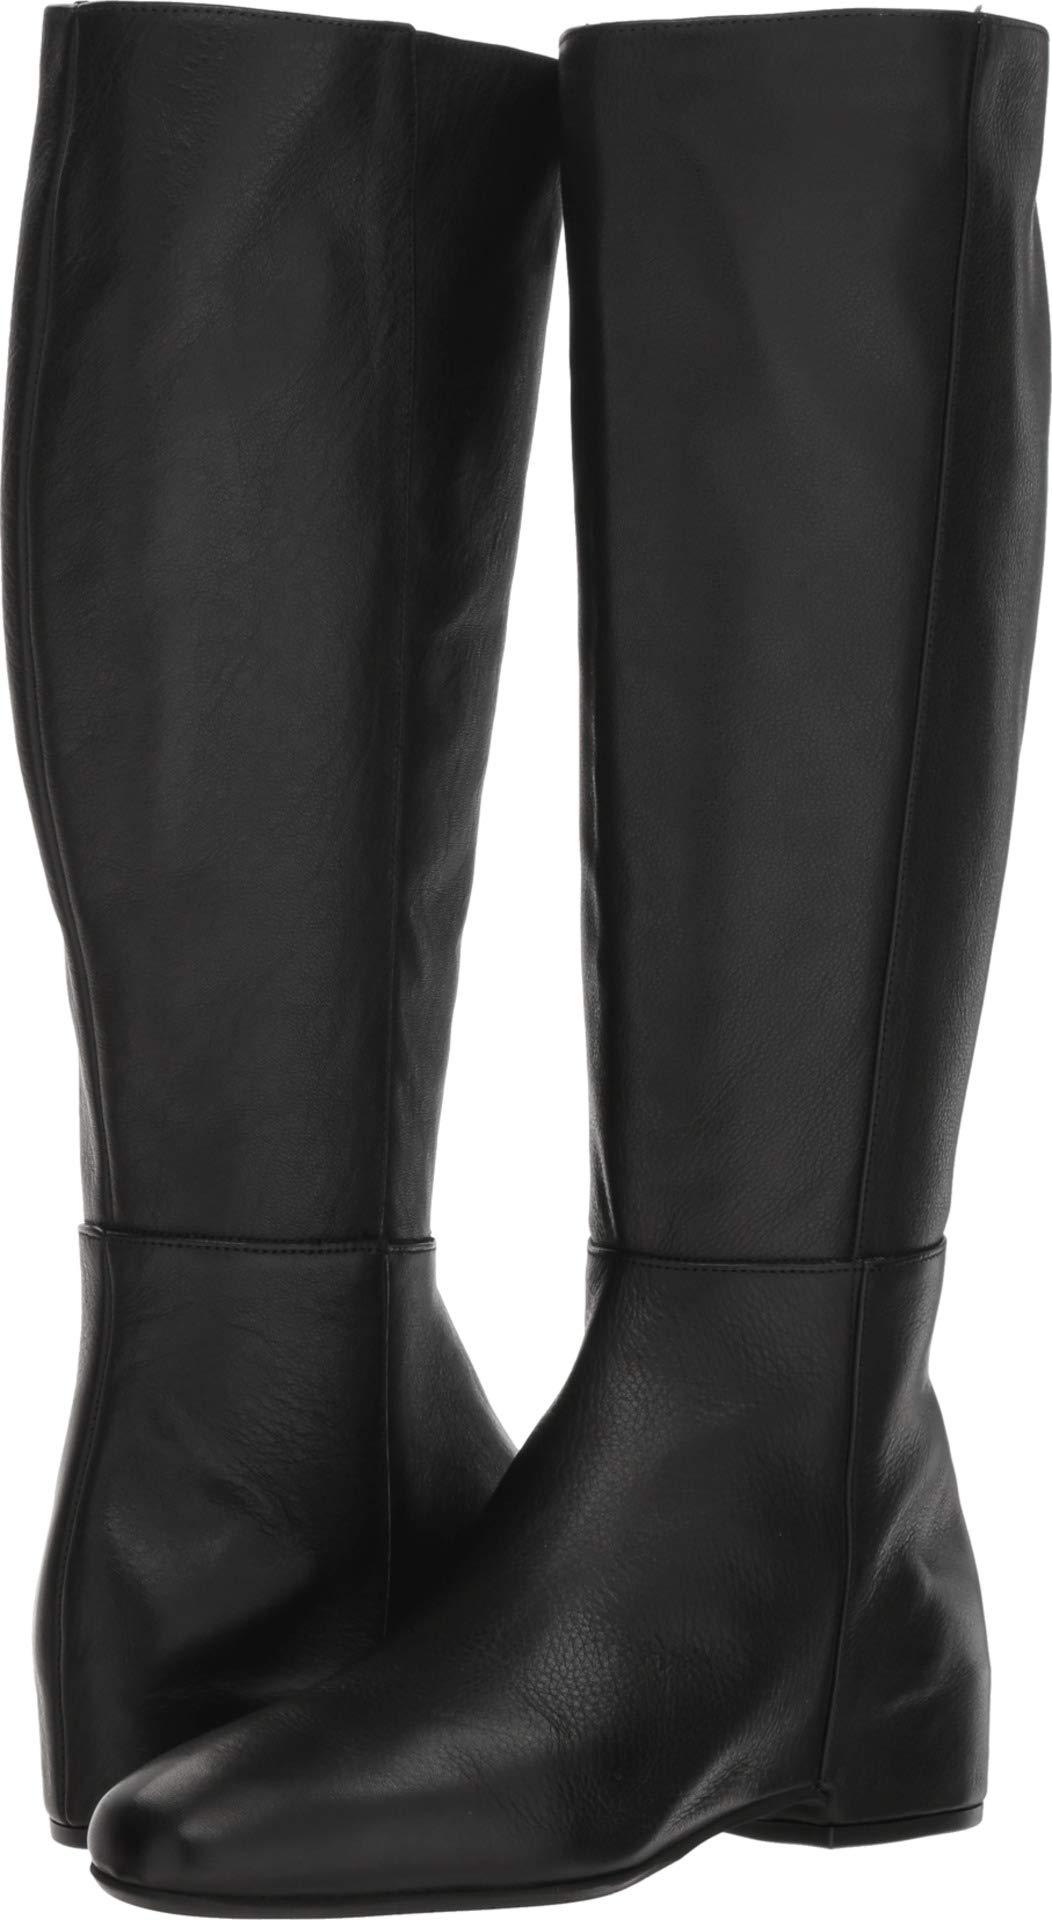 Aquatalia Women's URSA Tumbled Calf Fashion Boot Black 9.5 M US by Aquatalia